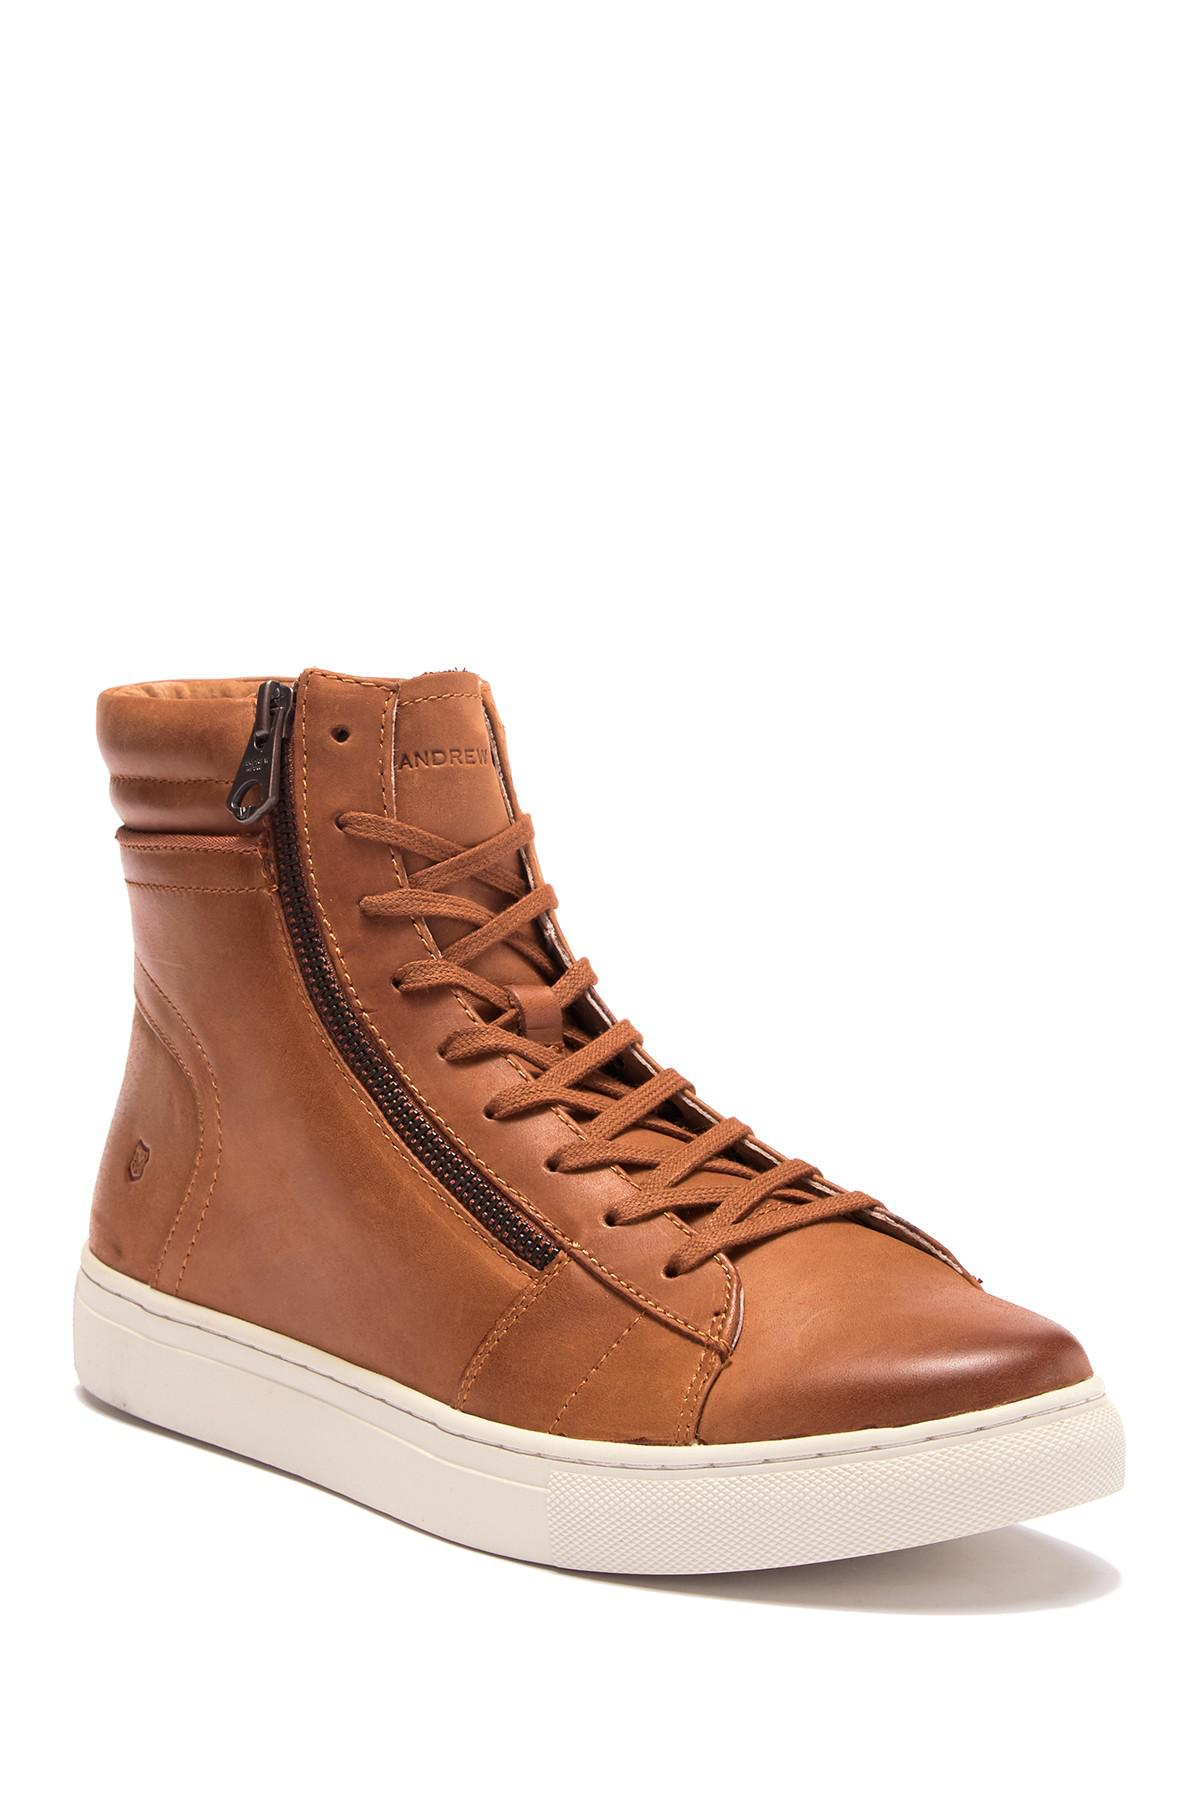 51ec841ca6a8 Lyst - Andrew Marc Remsen Sneaker in Brown for Men